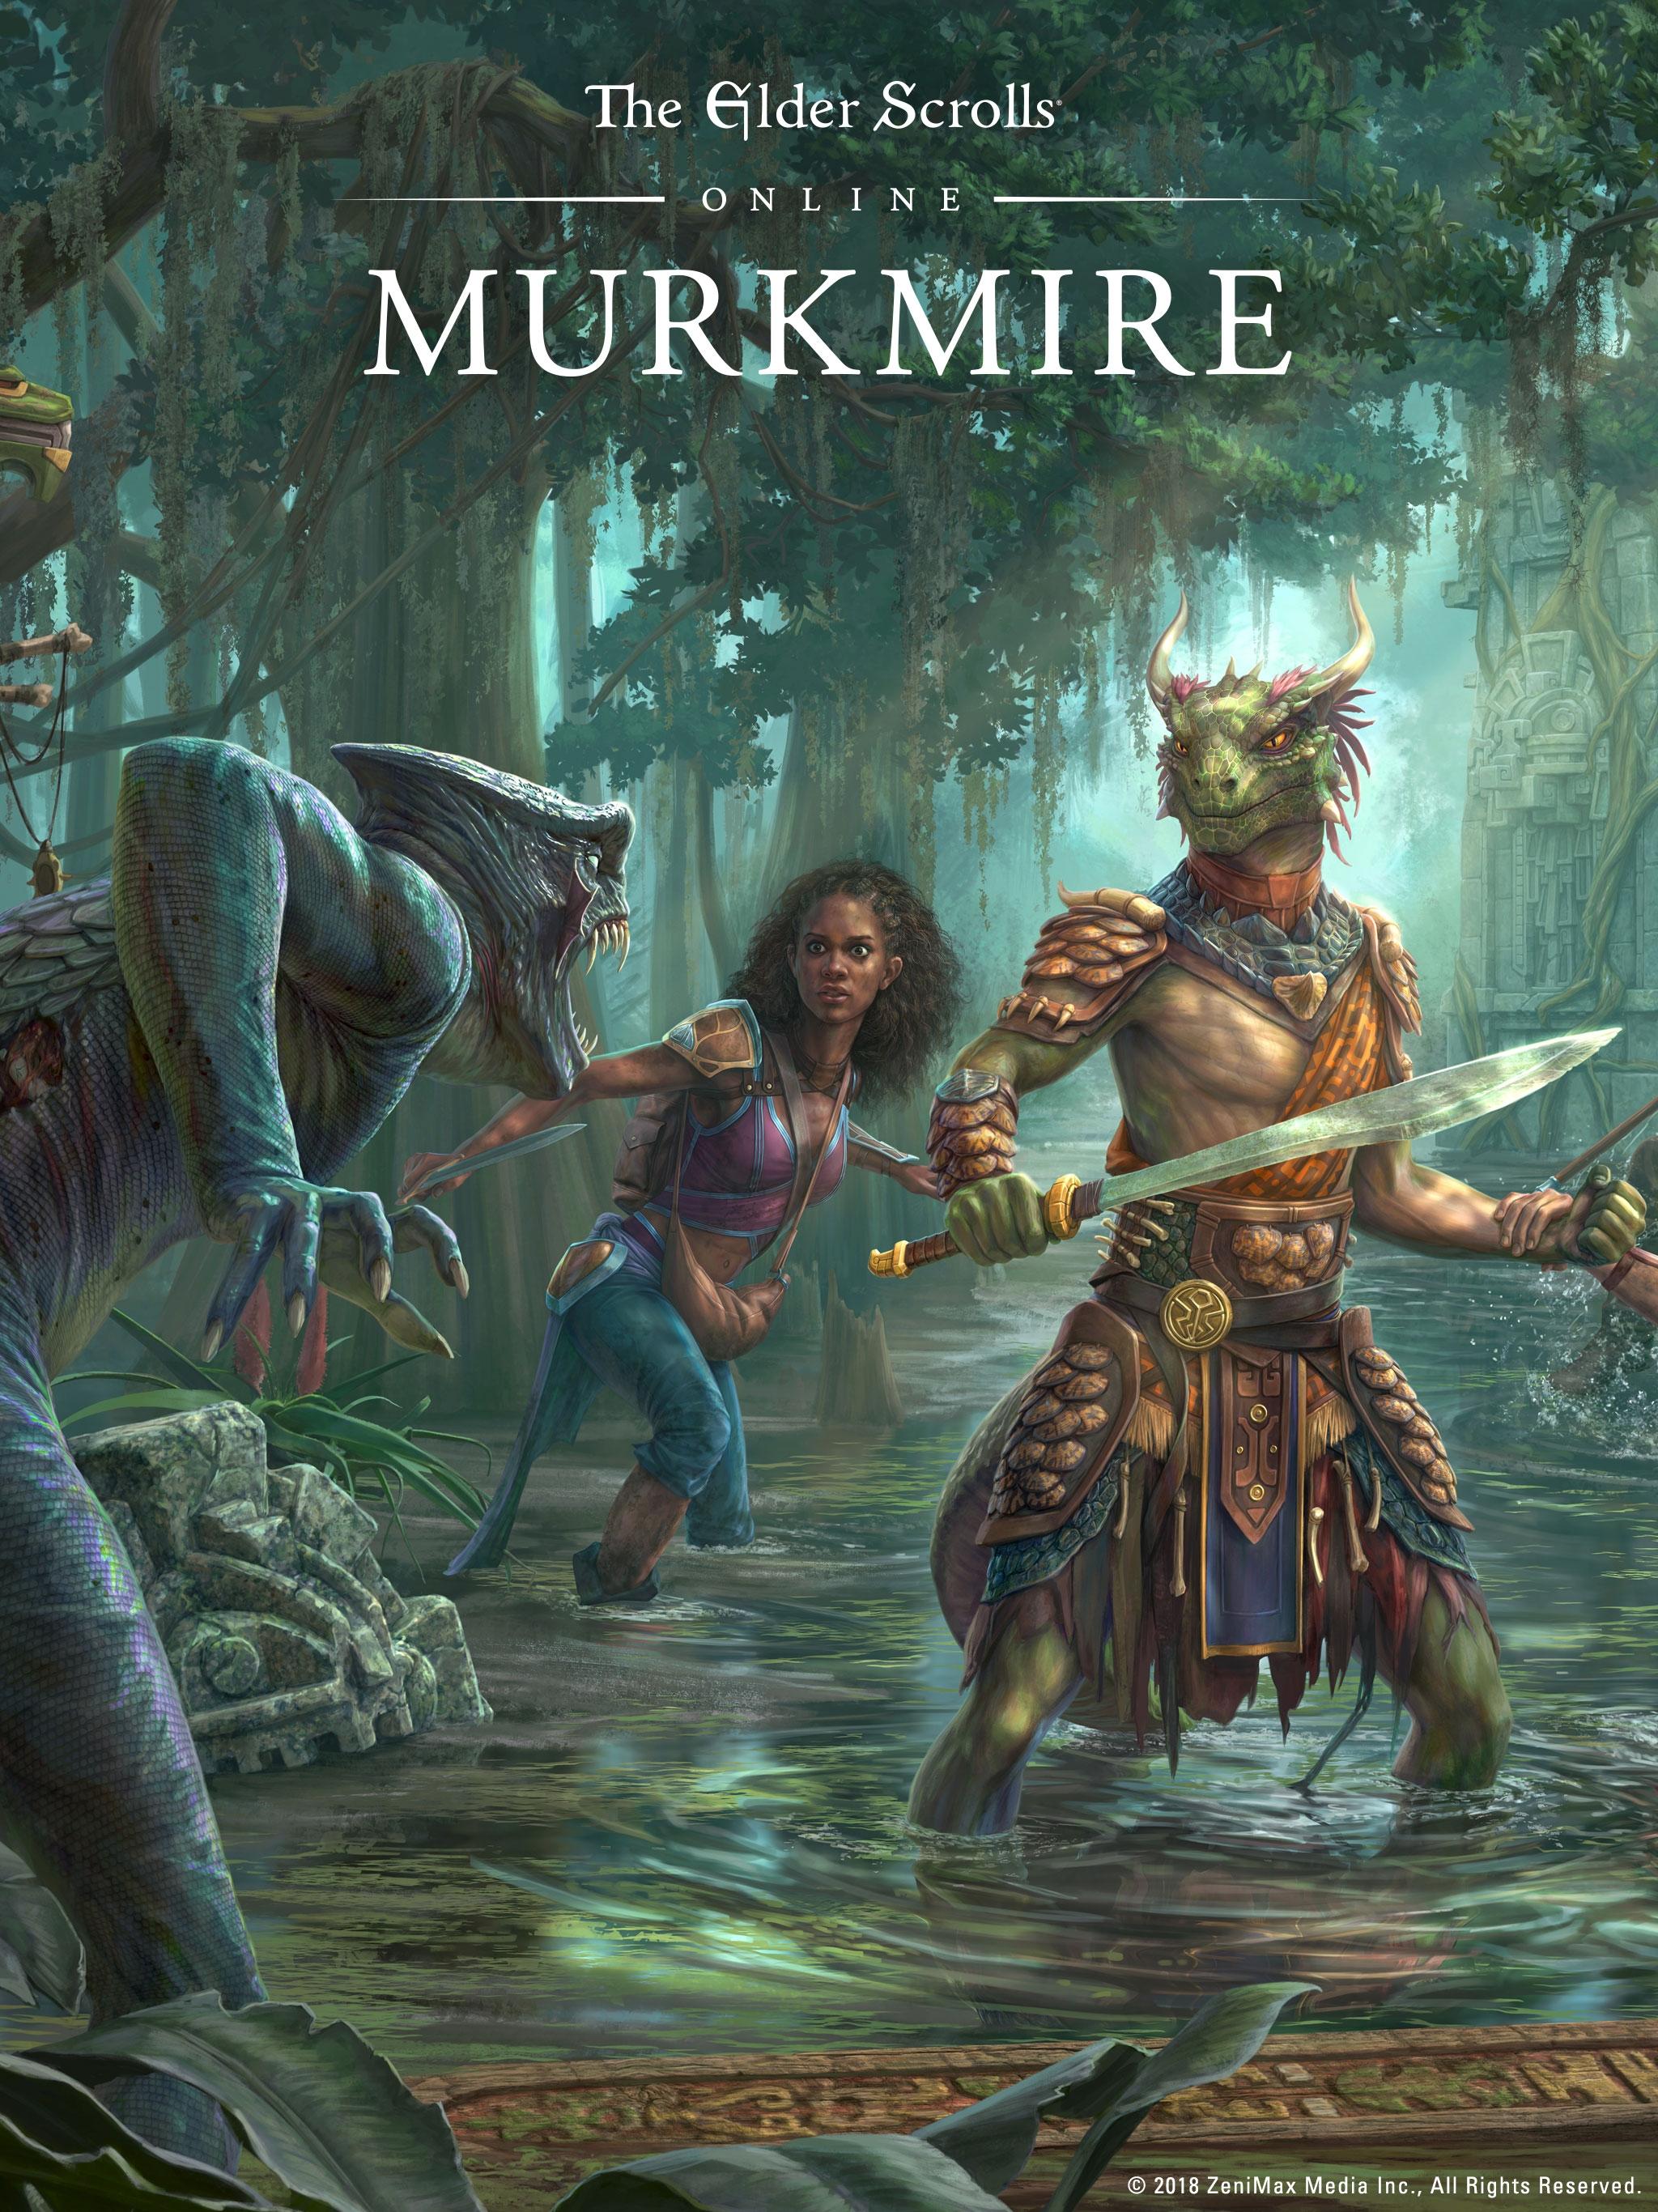 The Elder Scrolls Online: Murkmire - The Elder Scrolls Online